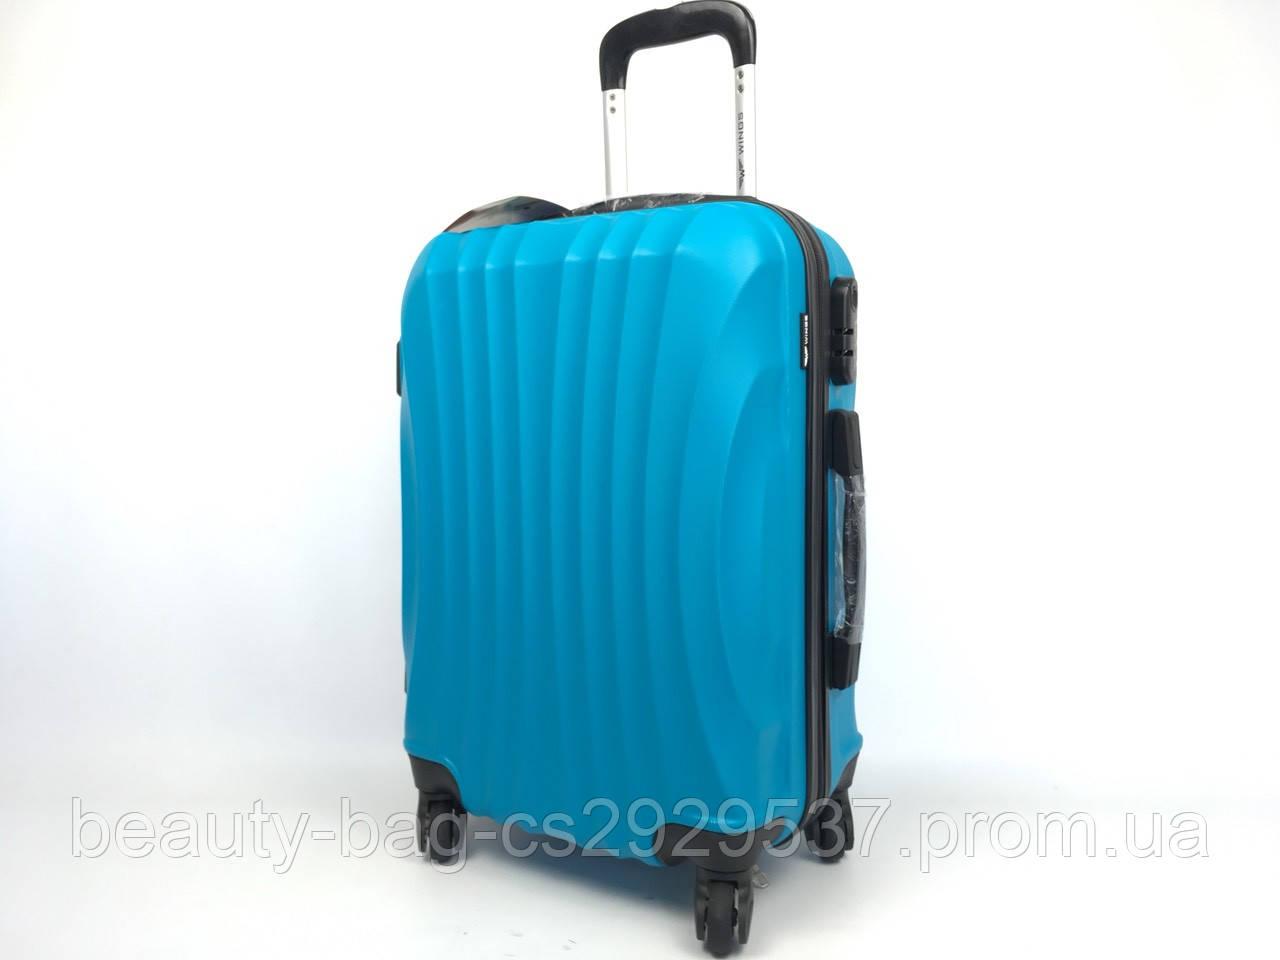 Чемодан пластиковый среднего размера Wings 159 Midi синий